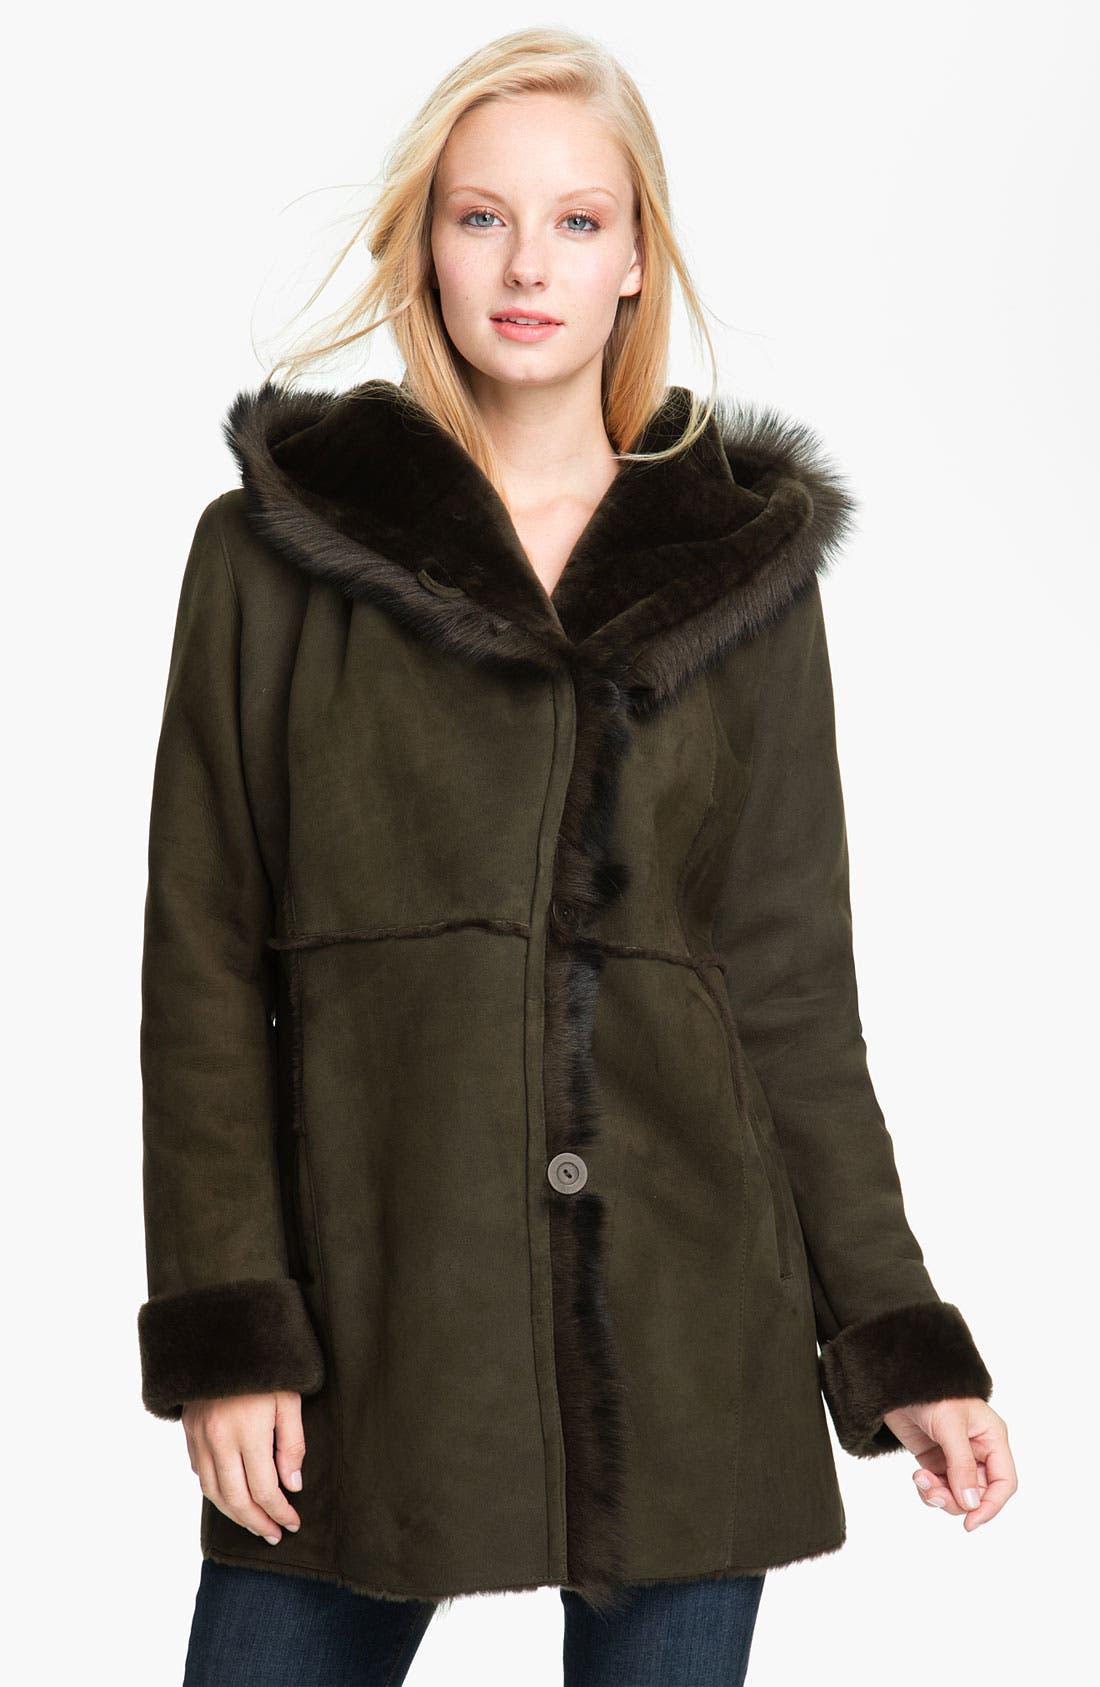 Alternate Image 1 Selected - Blue Duck Genuine Shearling Hooded Jacket